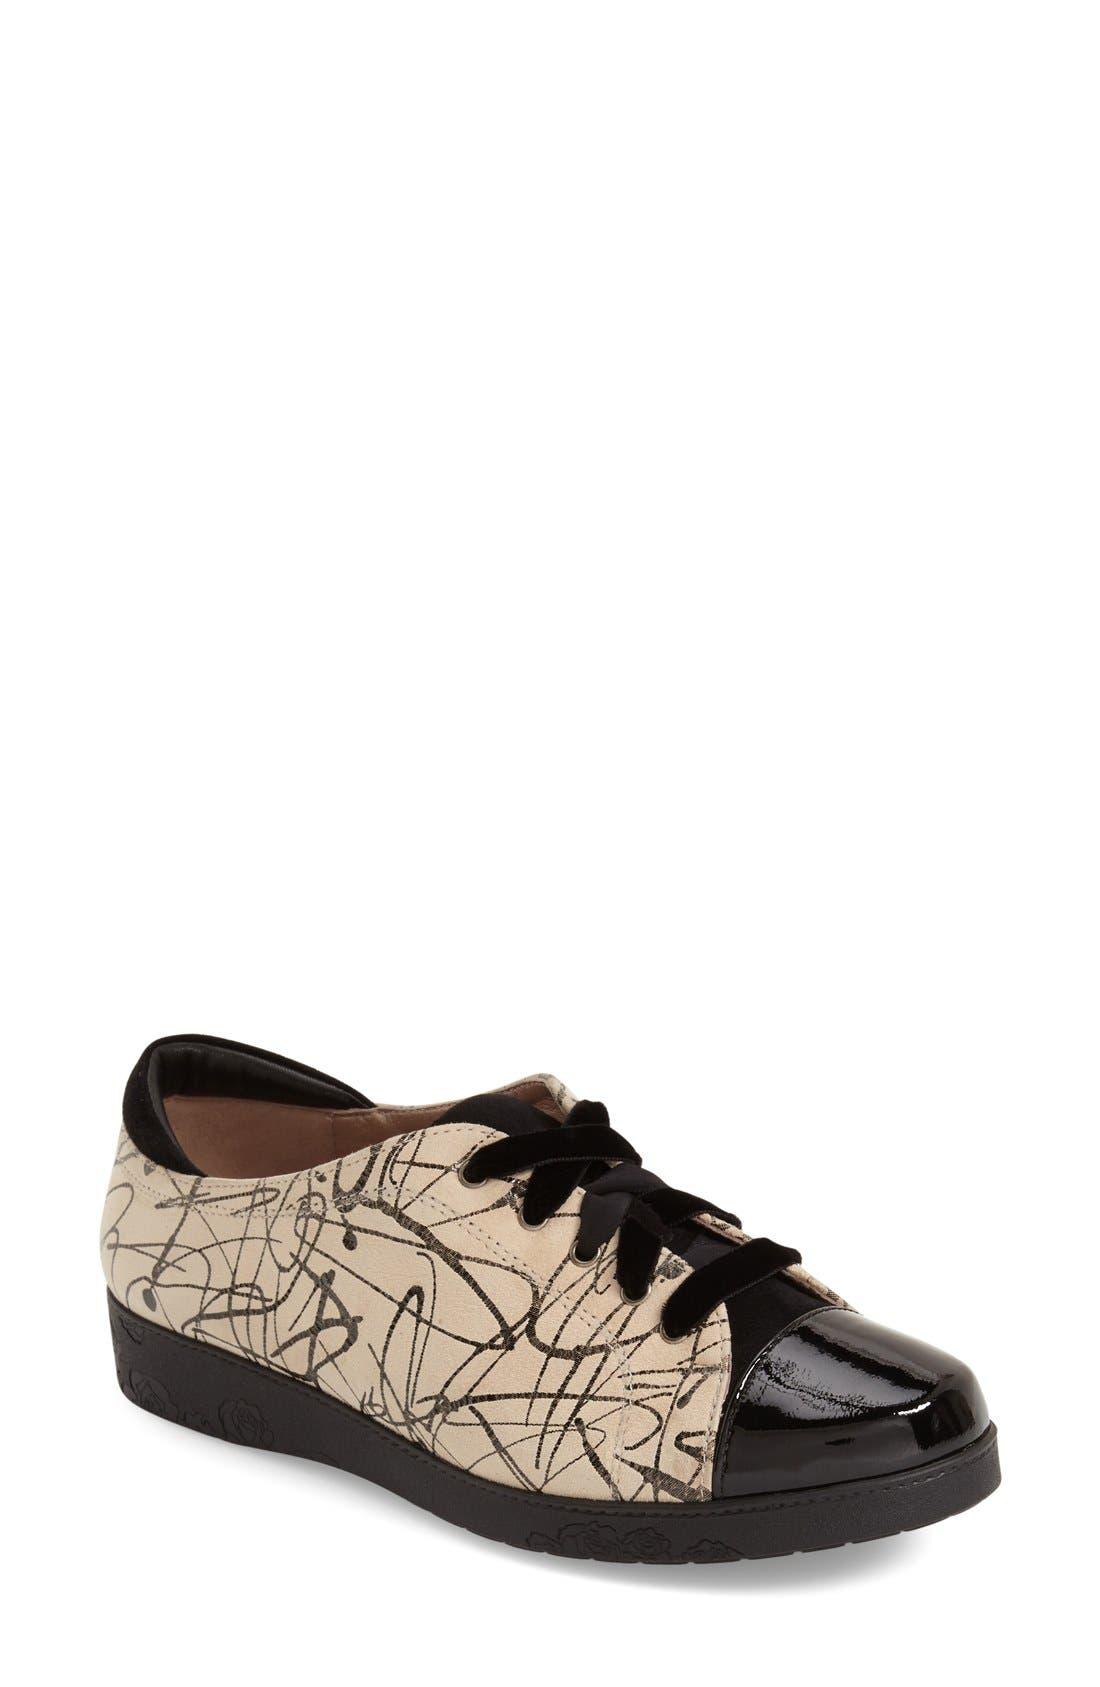 Alternate Image 1 Selected - BeautiFeel 'Cella' Cap Toe Sneaker (Women)